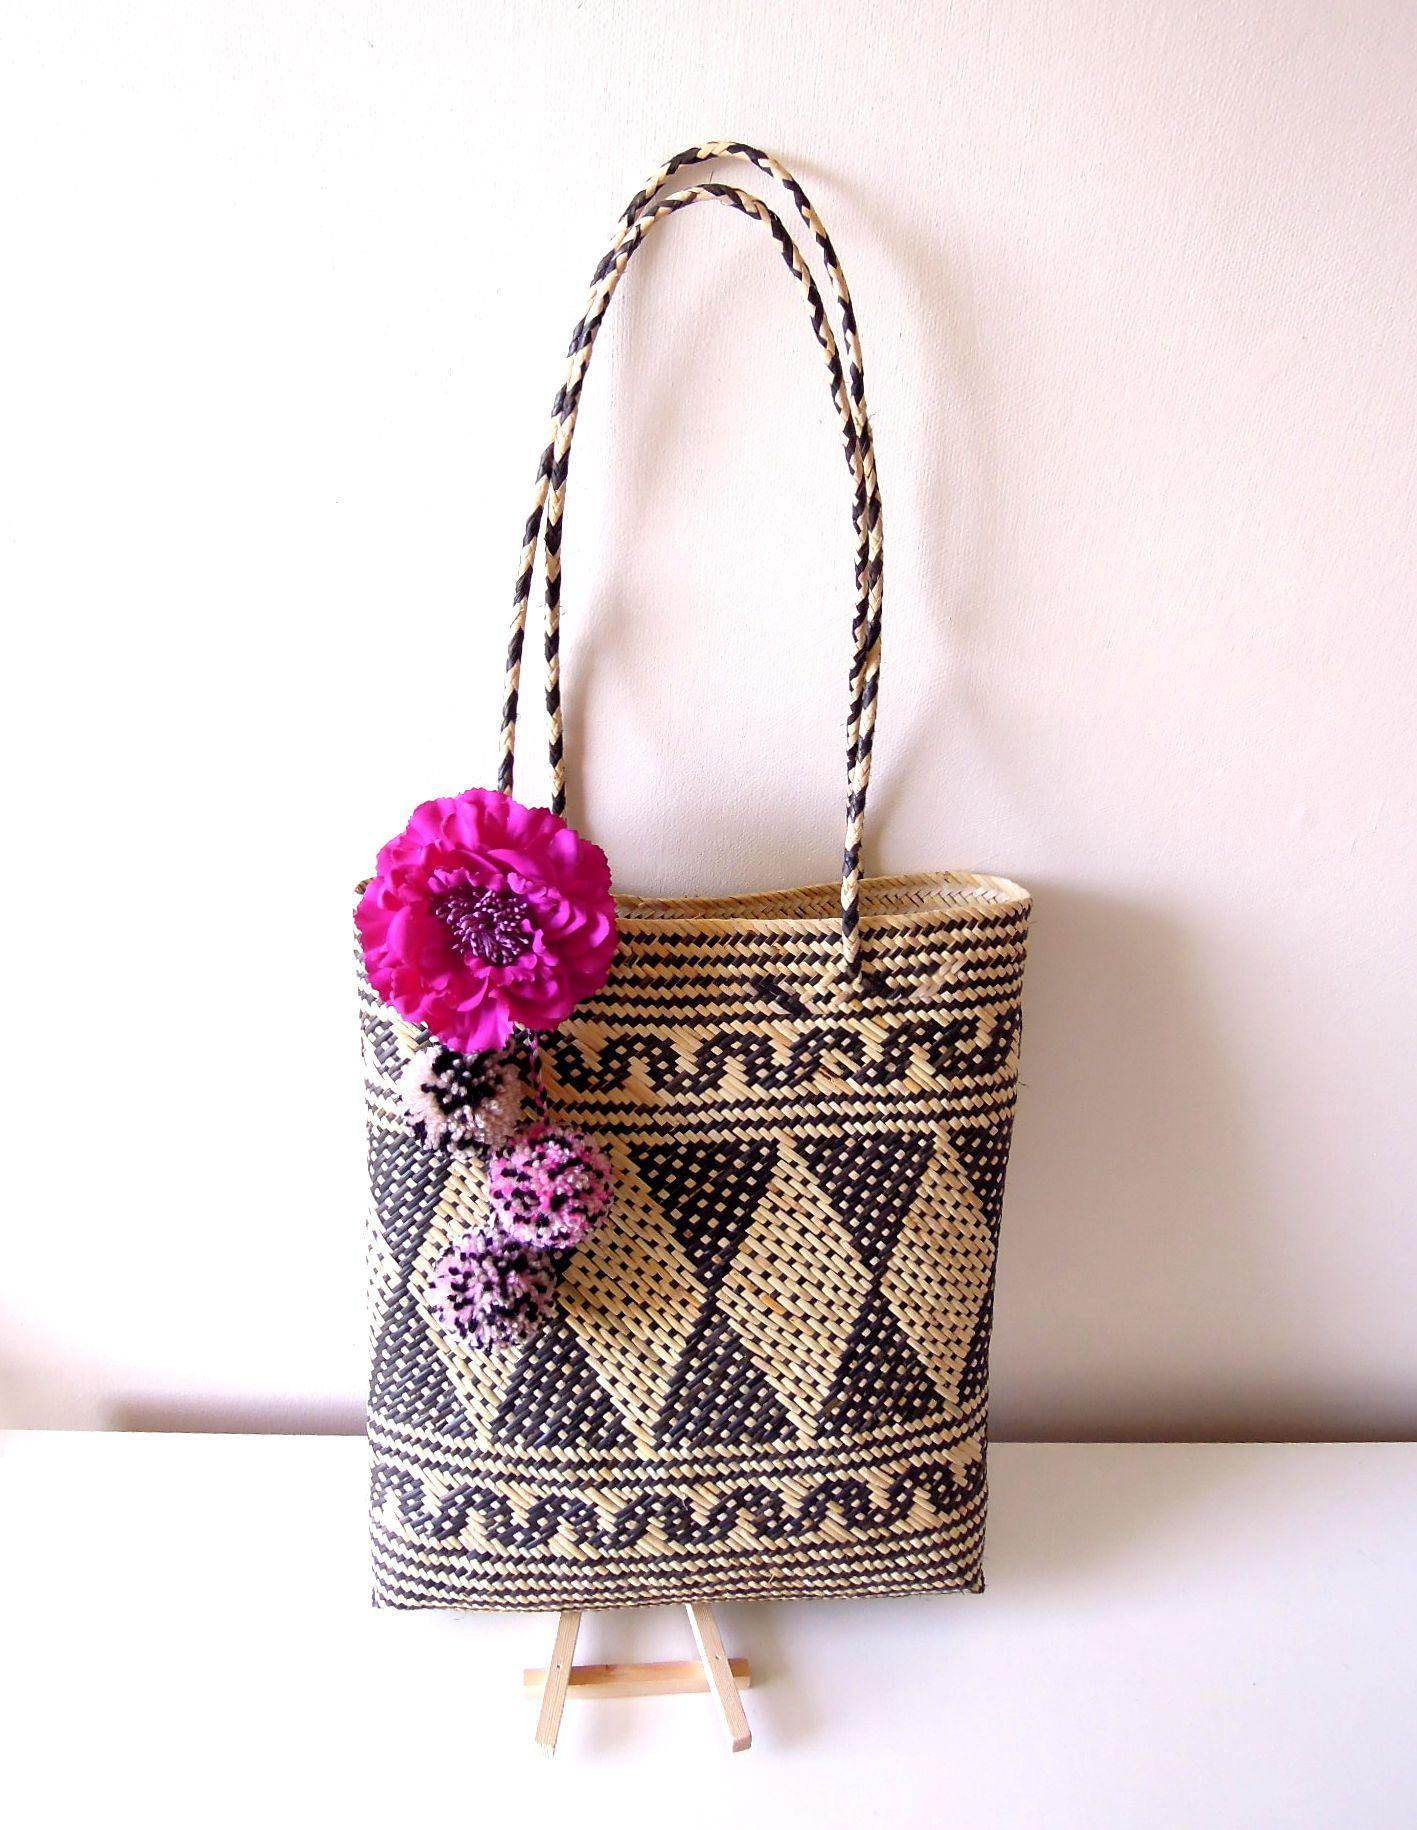 Handwoven rattan bag with pom poms and fabric flower – Boho tribal beach bag  – Ethnic tribal Borneo bag - Rattan beach bag by BrightonBabe on Etsy b988f63a6b545